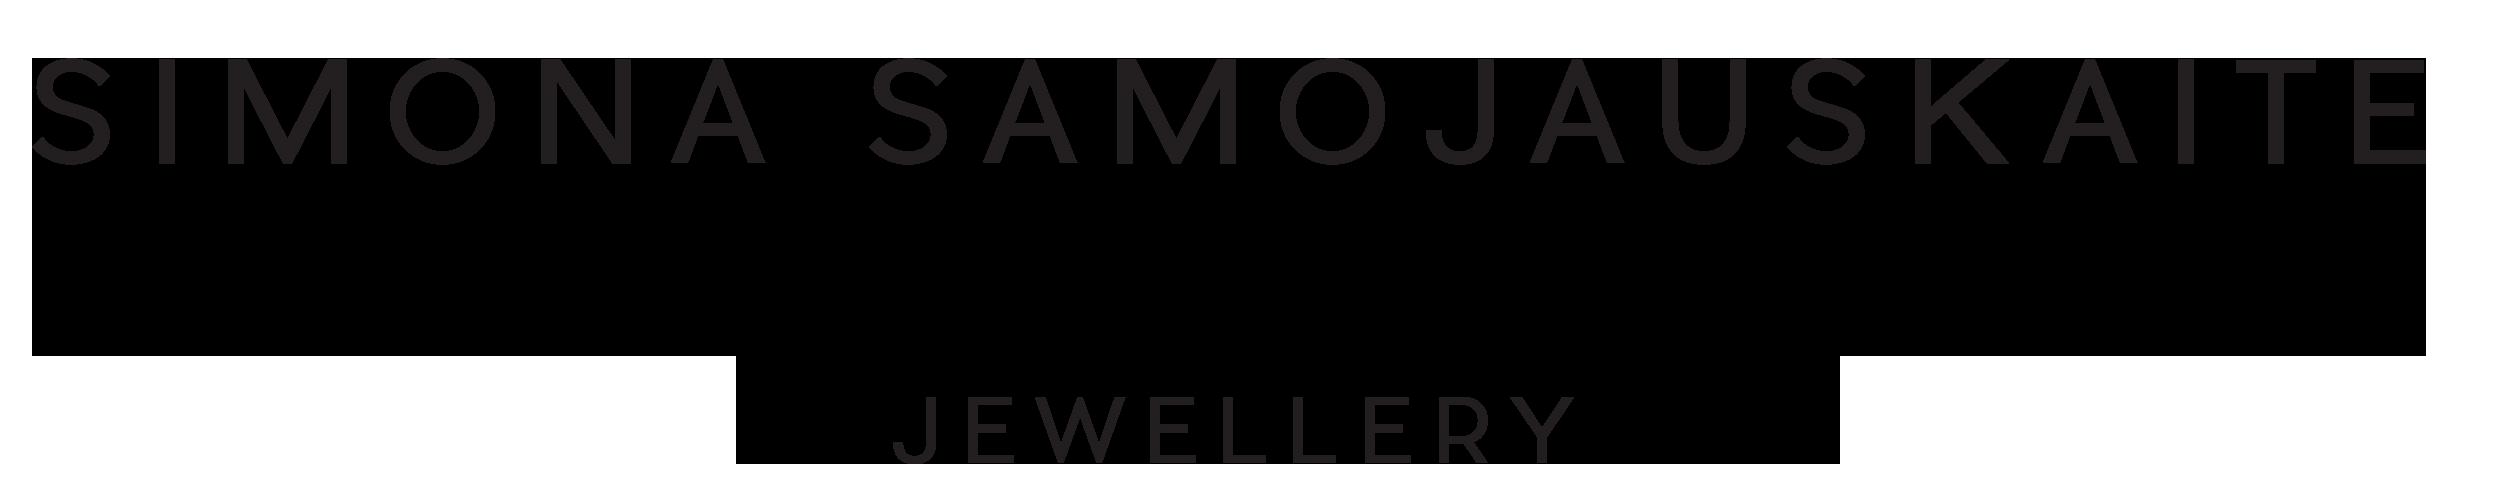 Simona Samojauskaite Jewellery